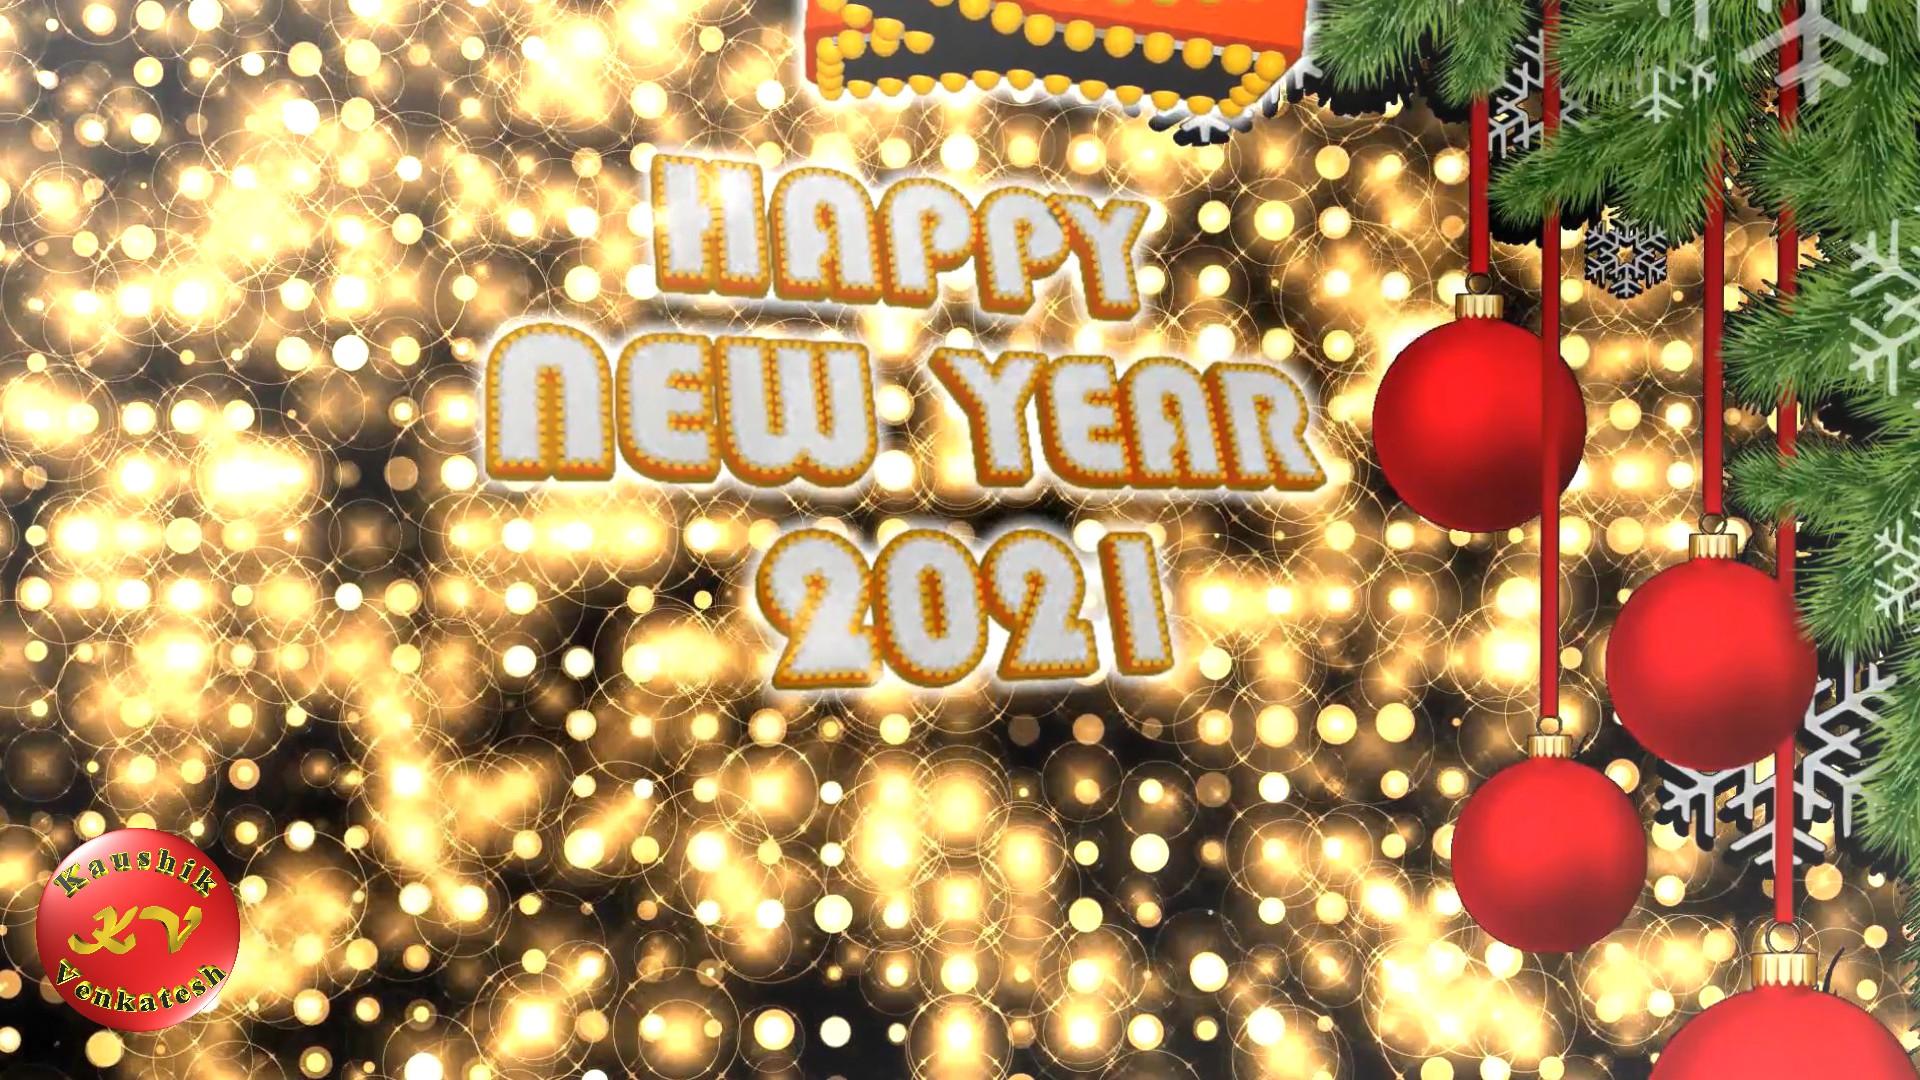 New Year Greetings Image 2021